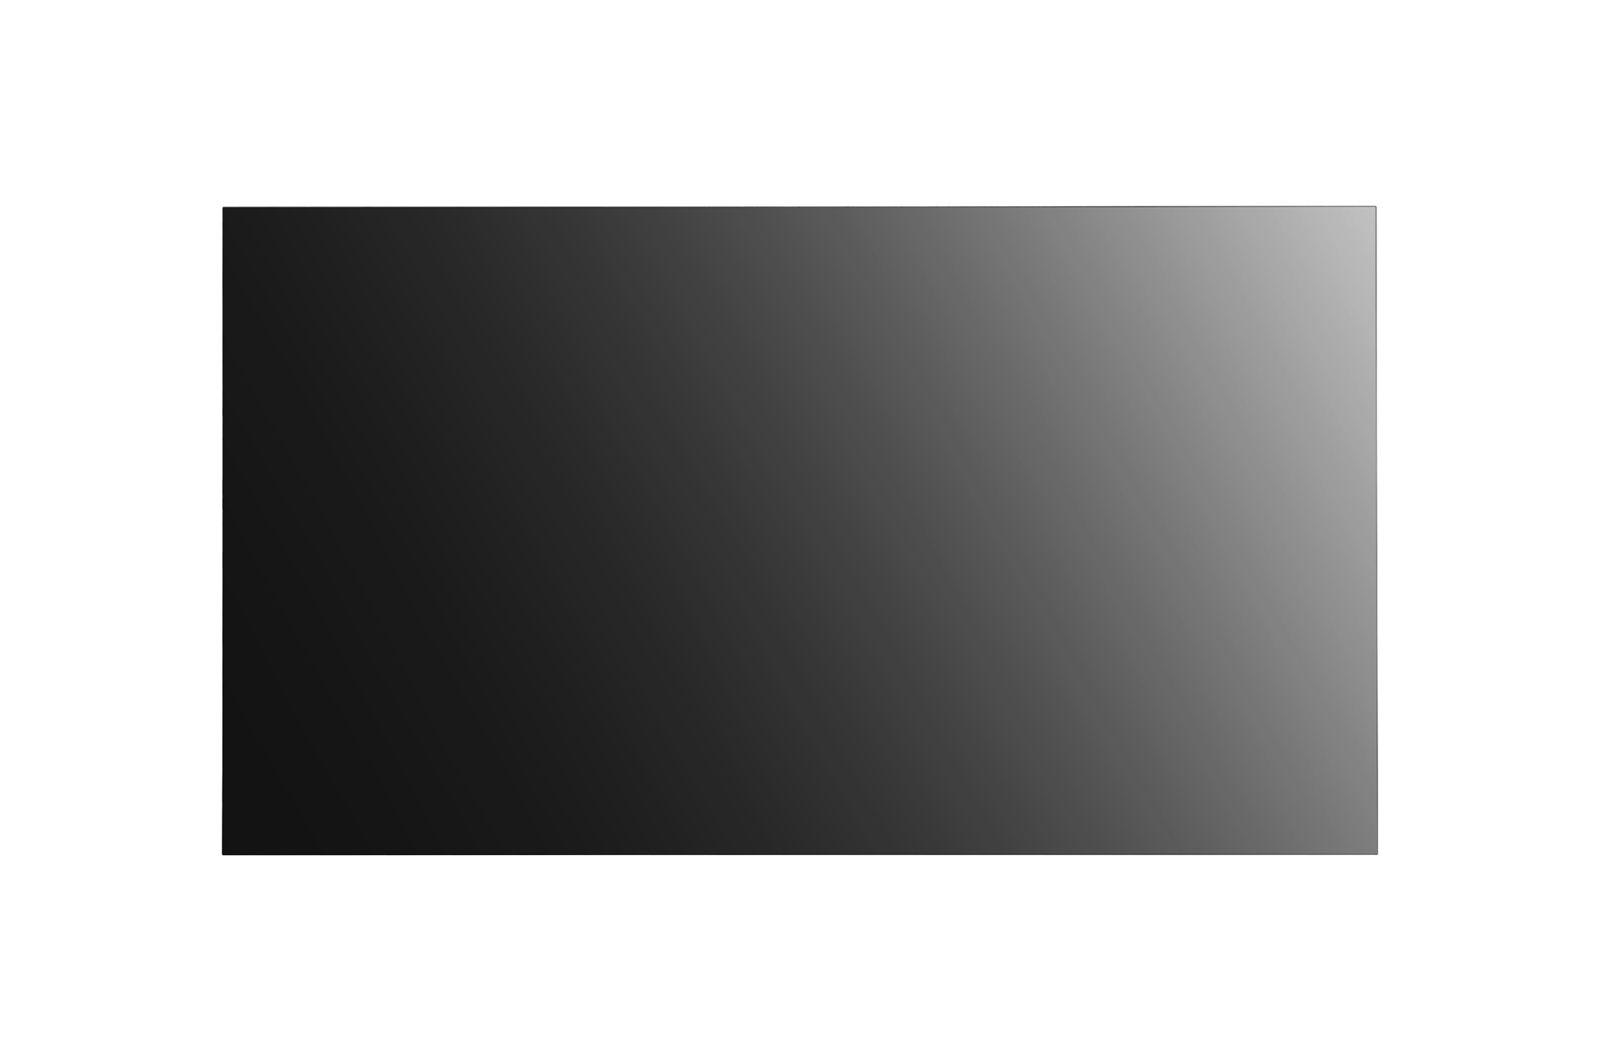 LG MONITOR 49 LED 49VM5E-A.AEU